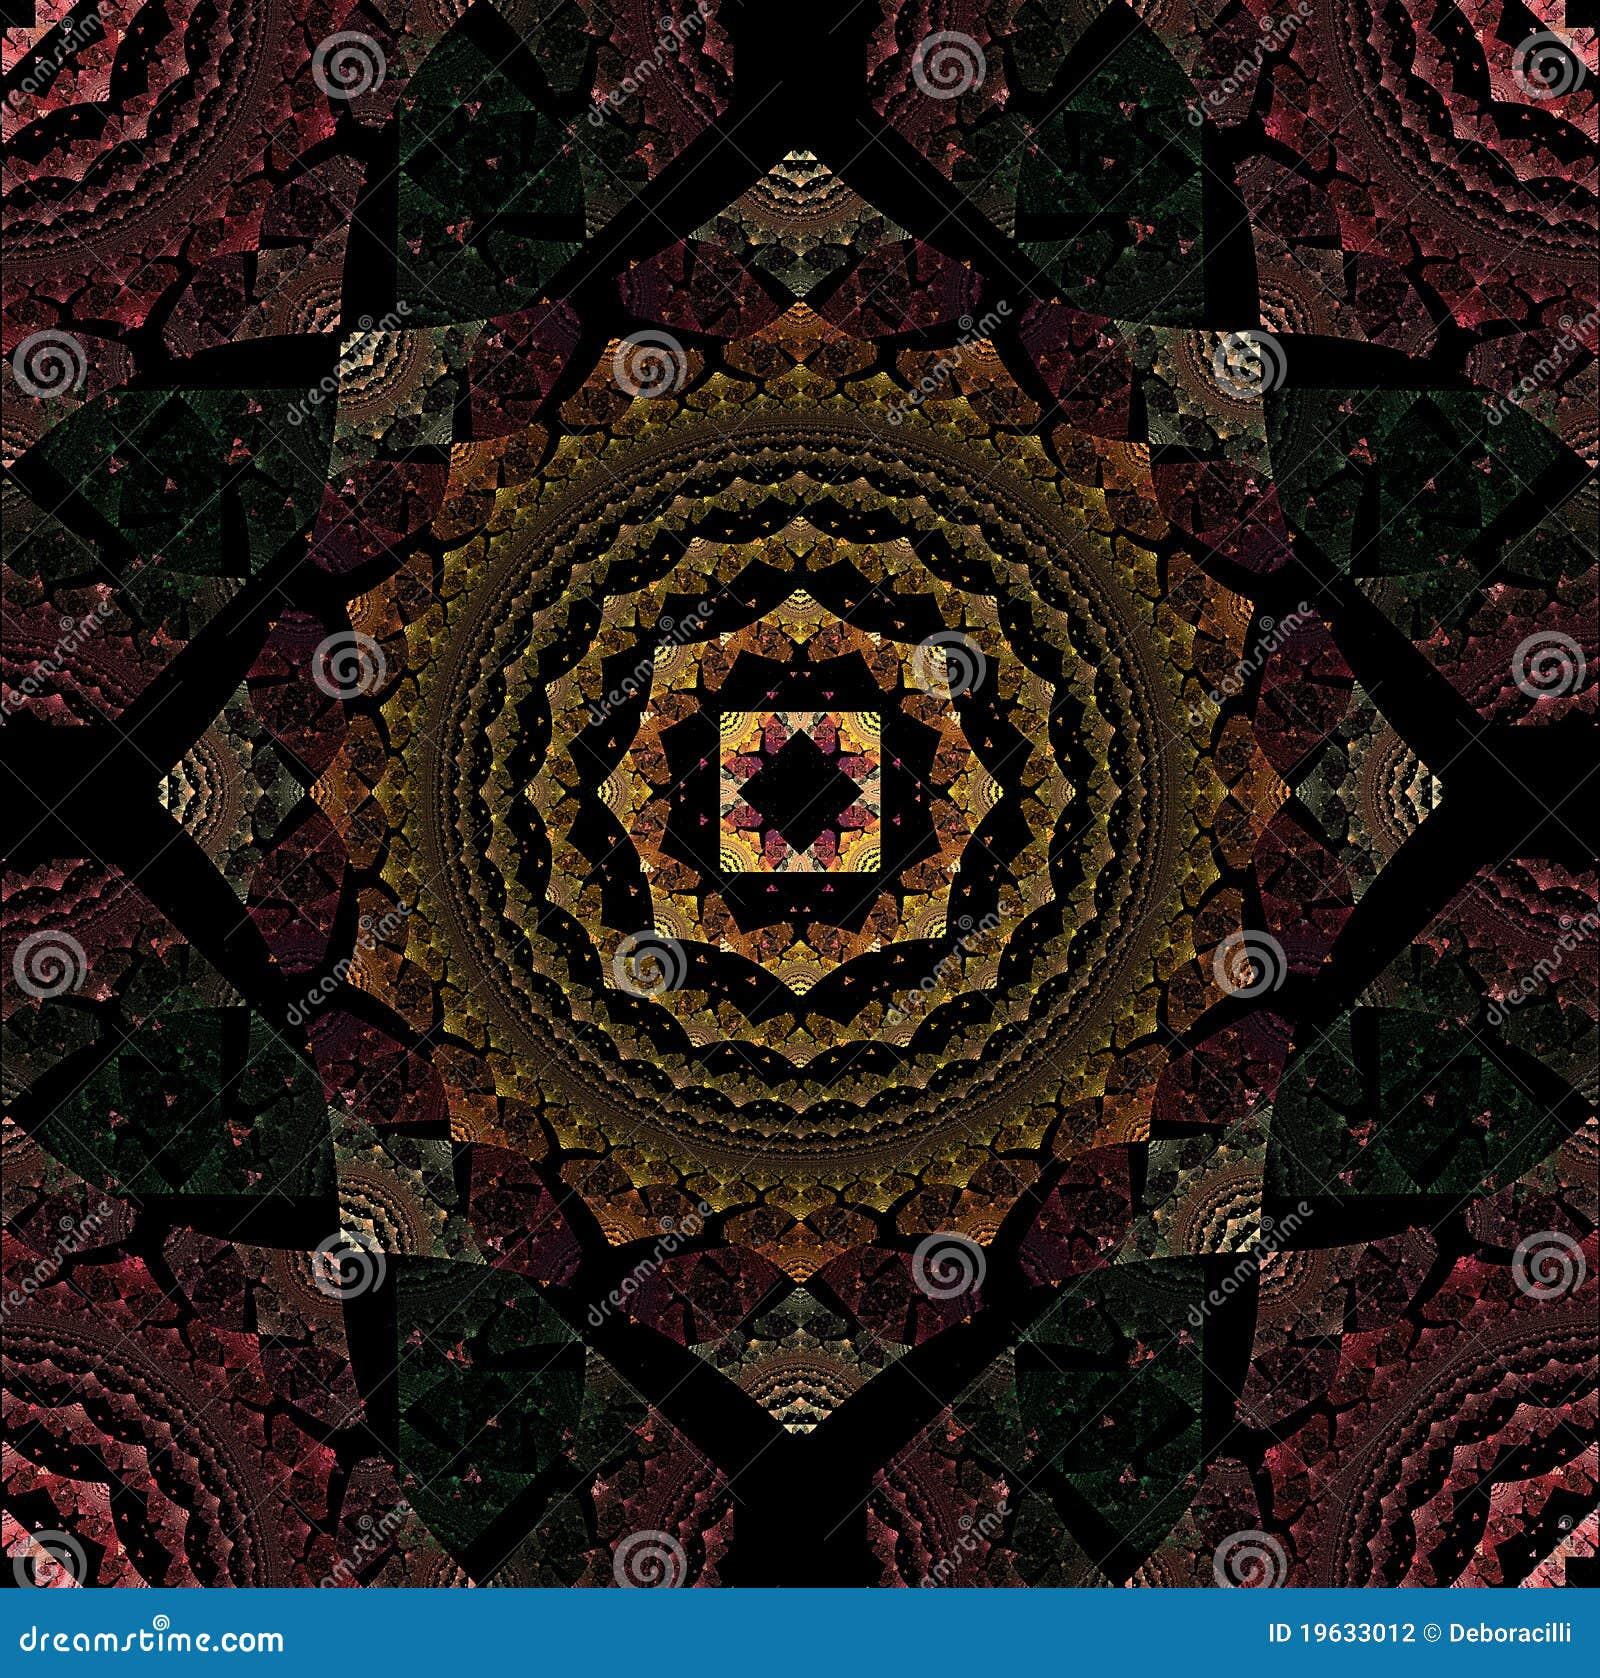 Apophysis background